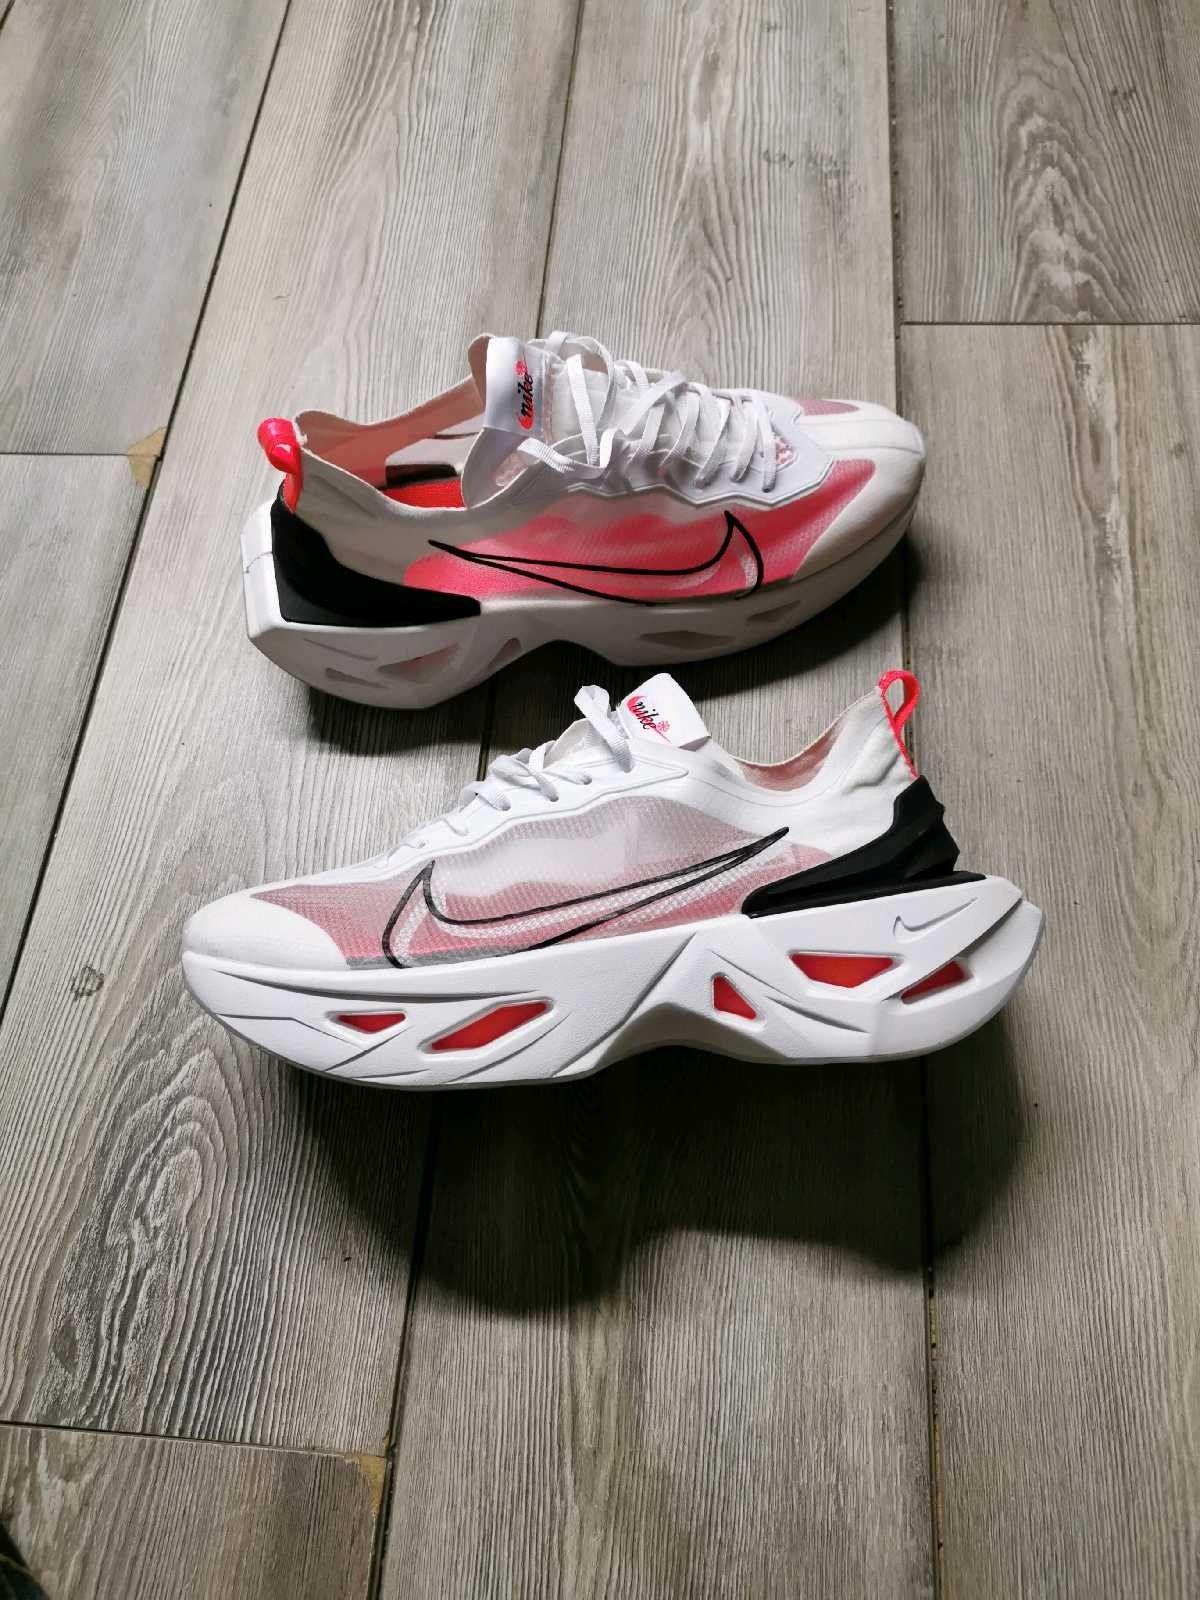 Nike Vista grind Summer is coming